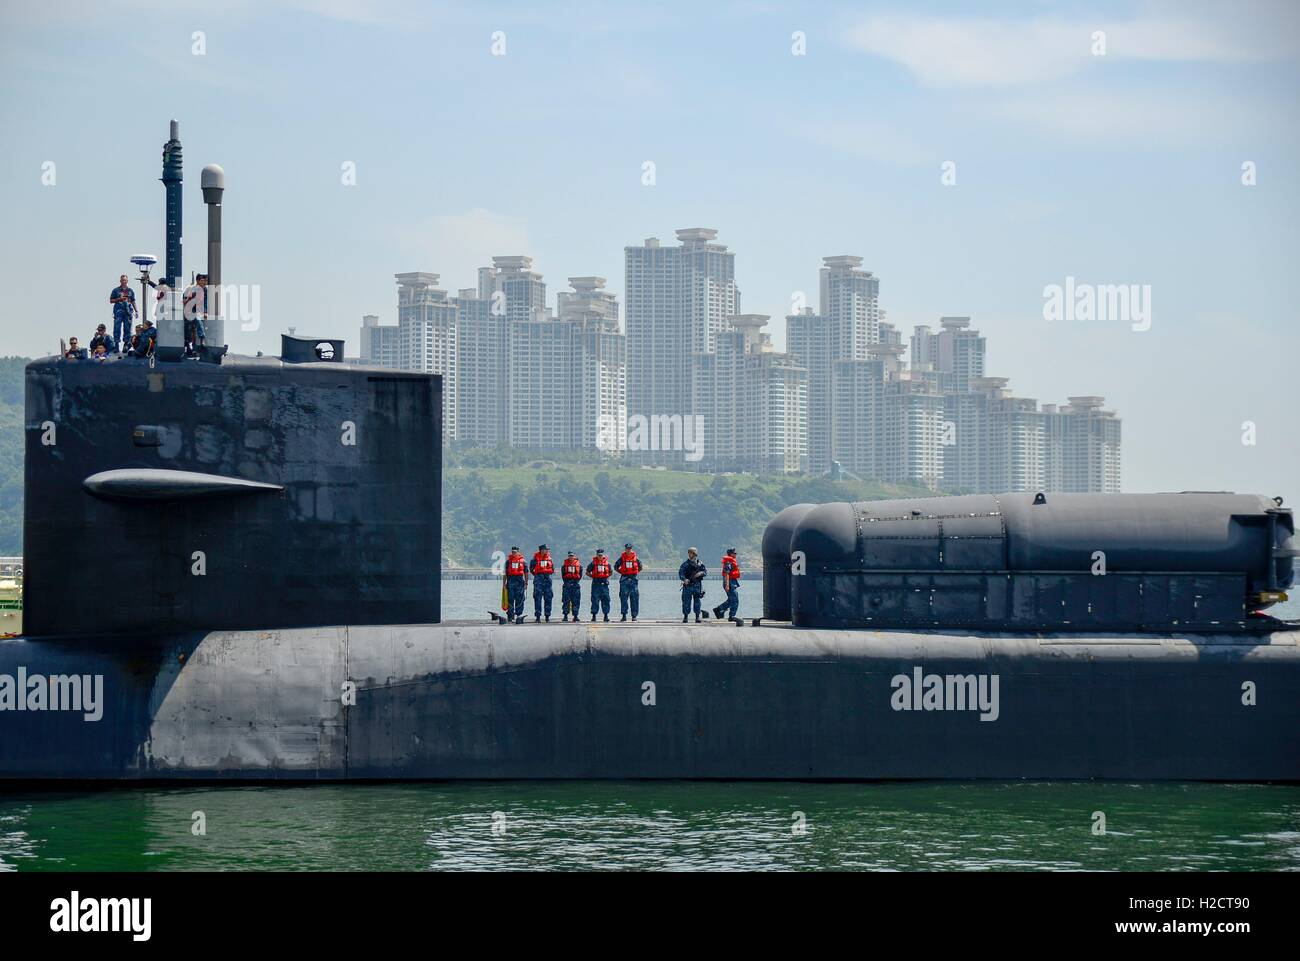 Ohio Class Stockfotos & Ohio Class Bilder - Alamy